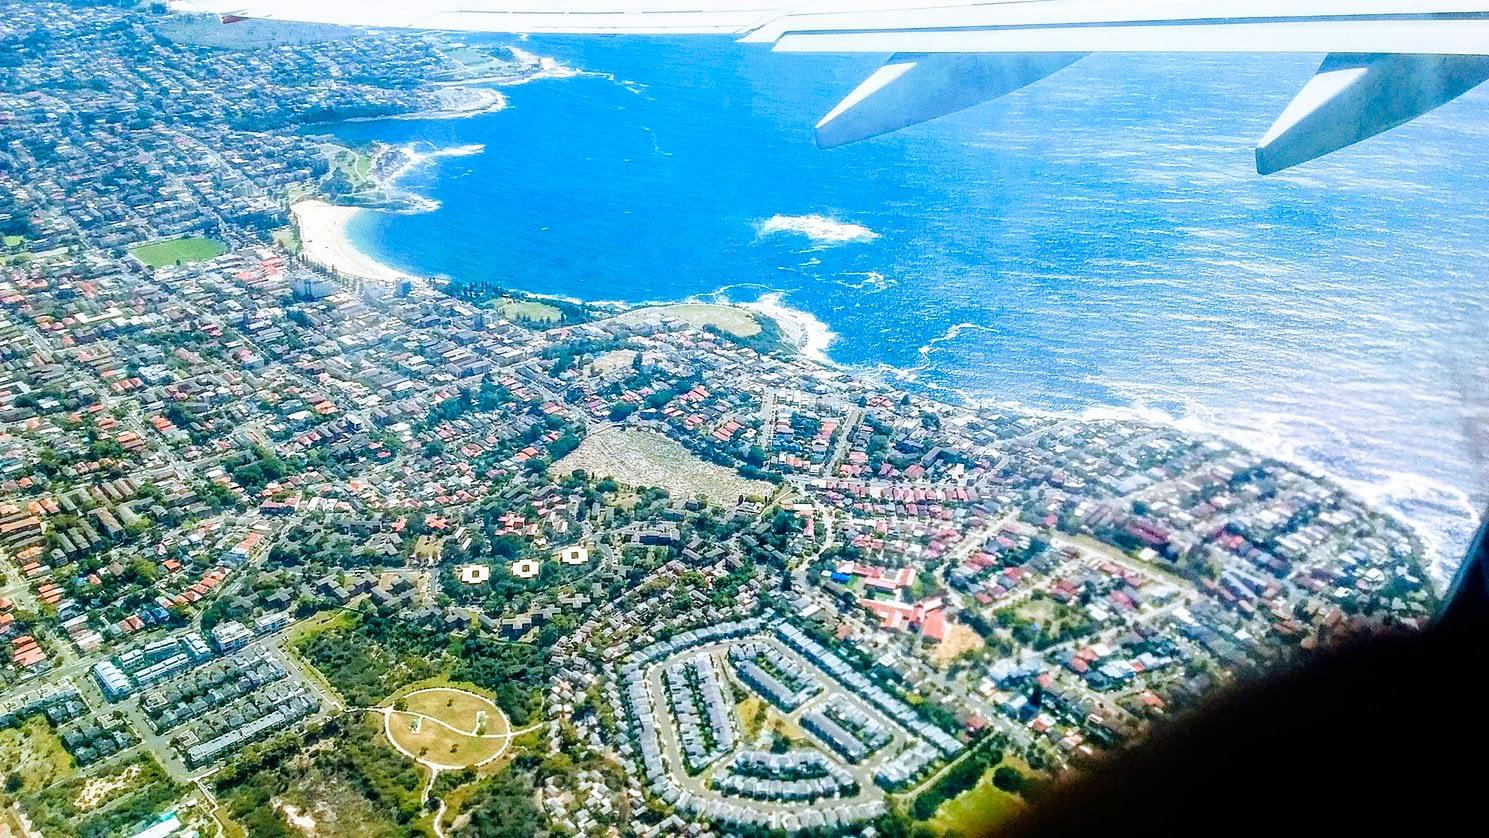 Flight to Tasmania - View from above of Tasmania coastline - Things to Do in Tasmania